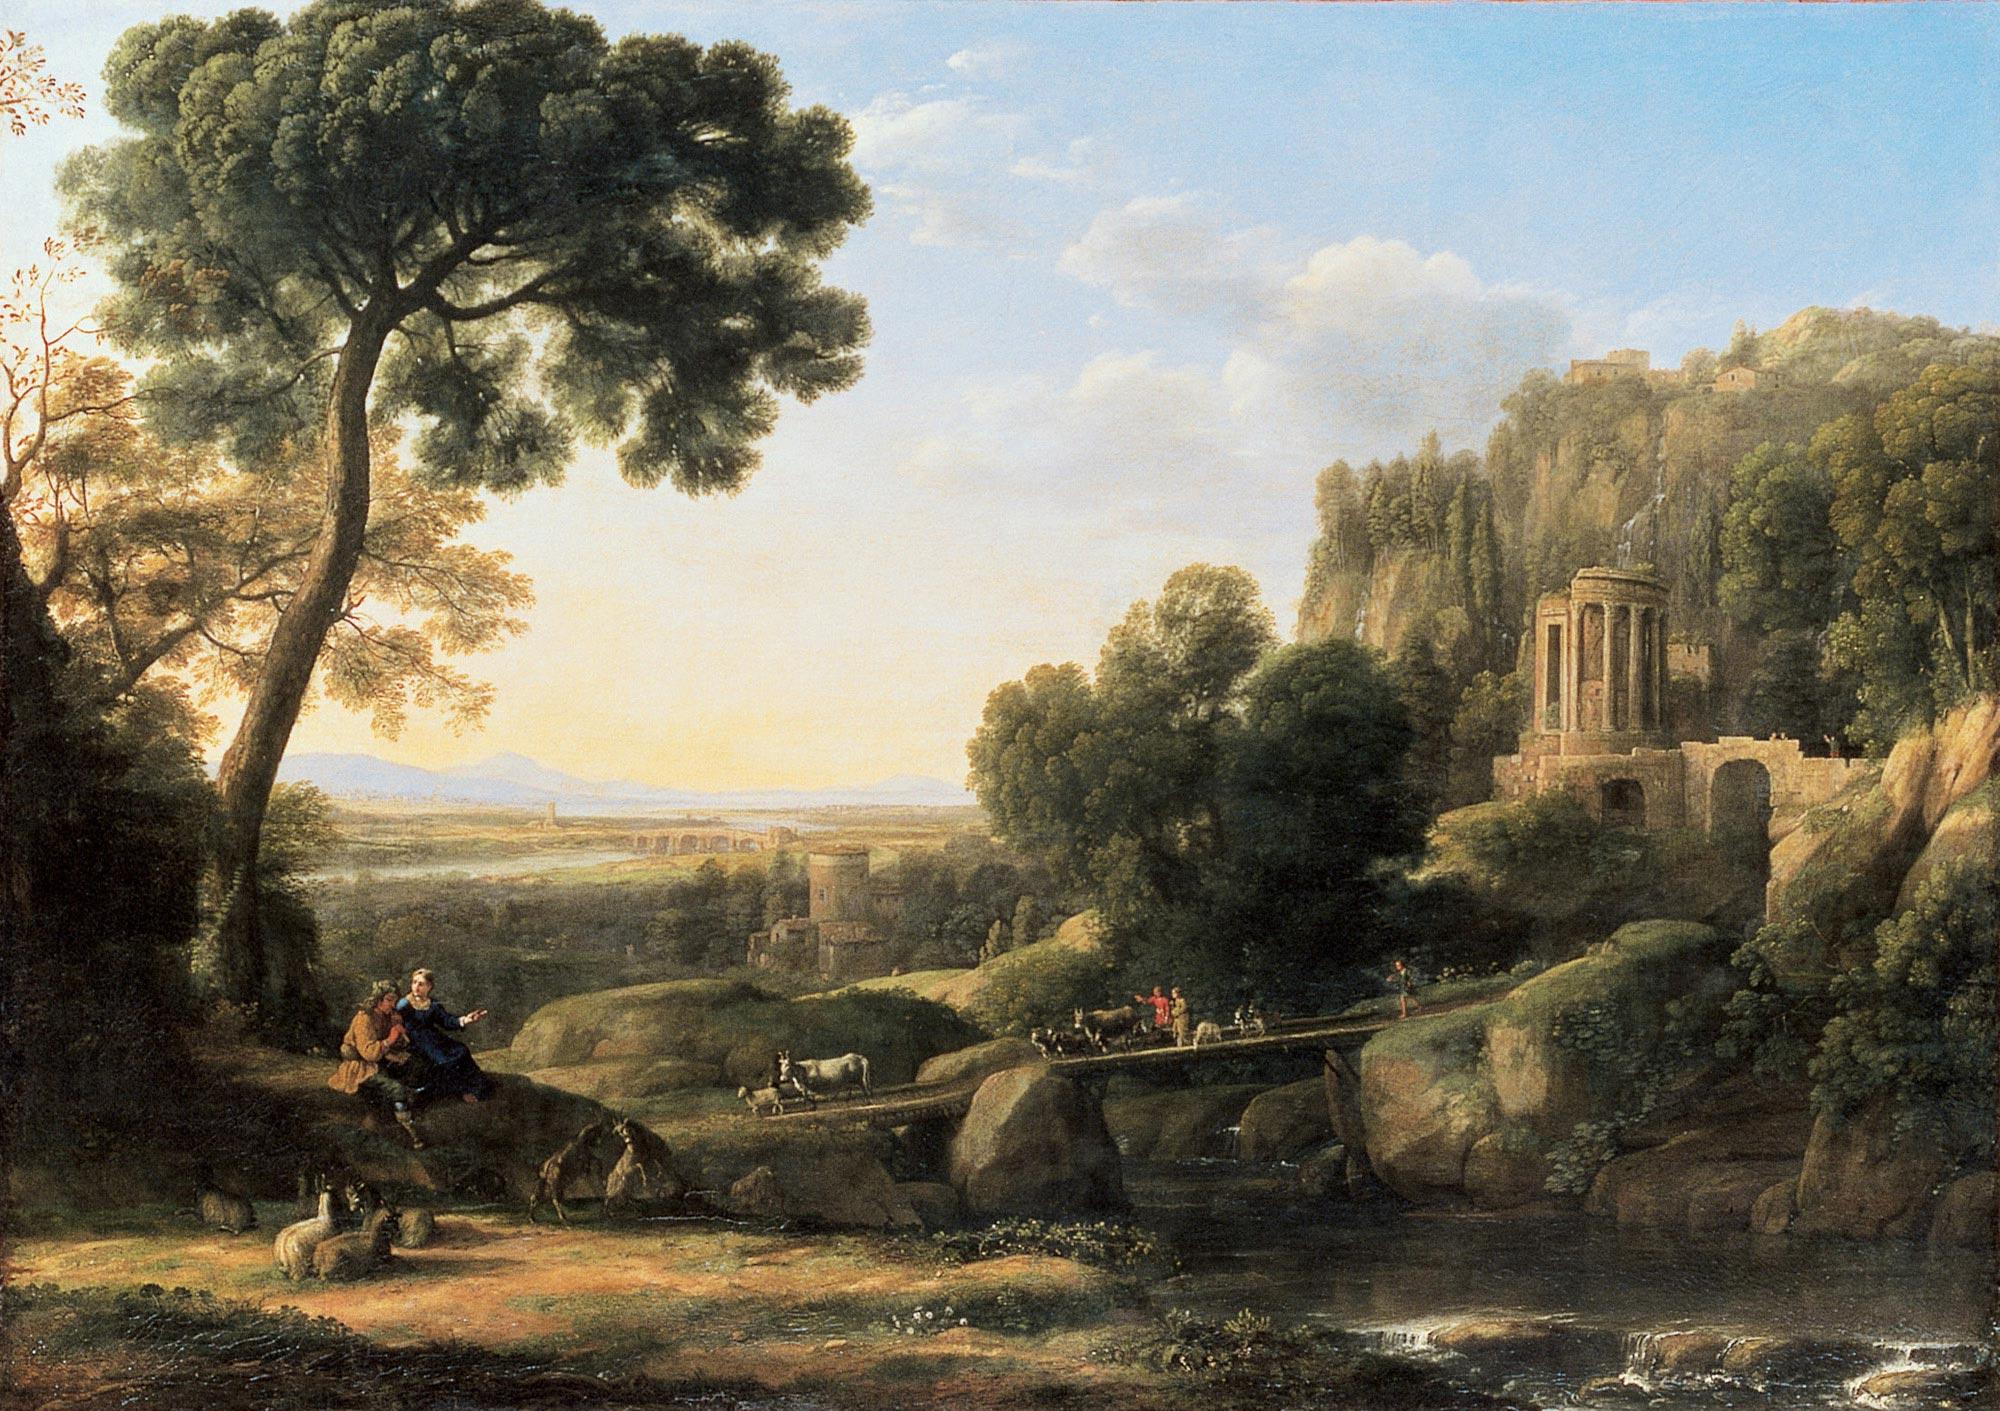 Claude Lorrain - Paysage pastoral